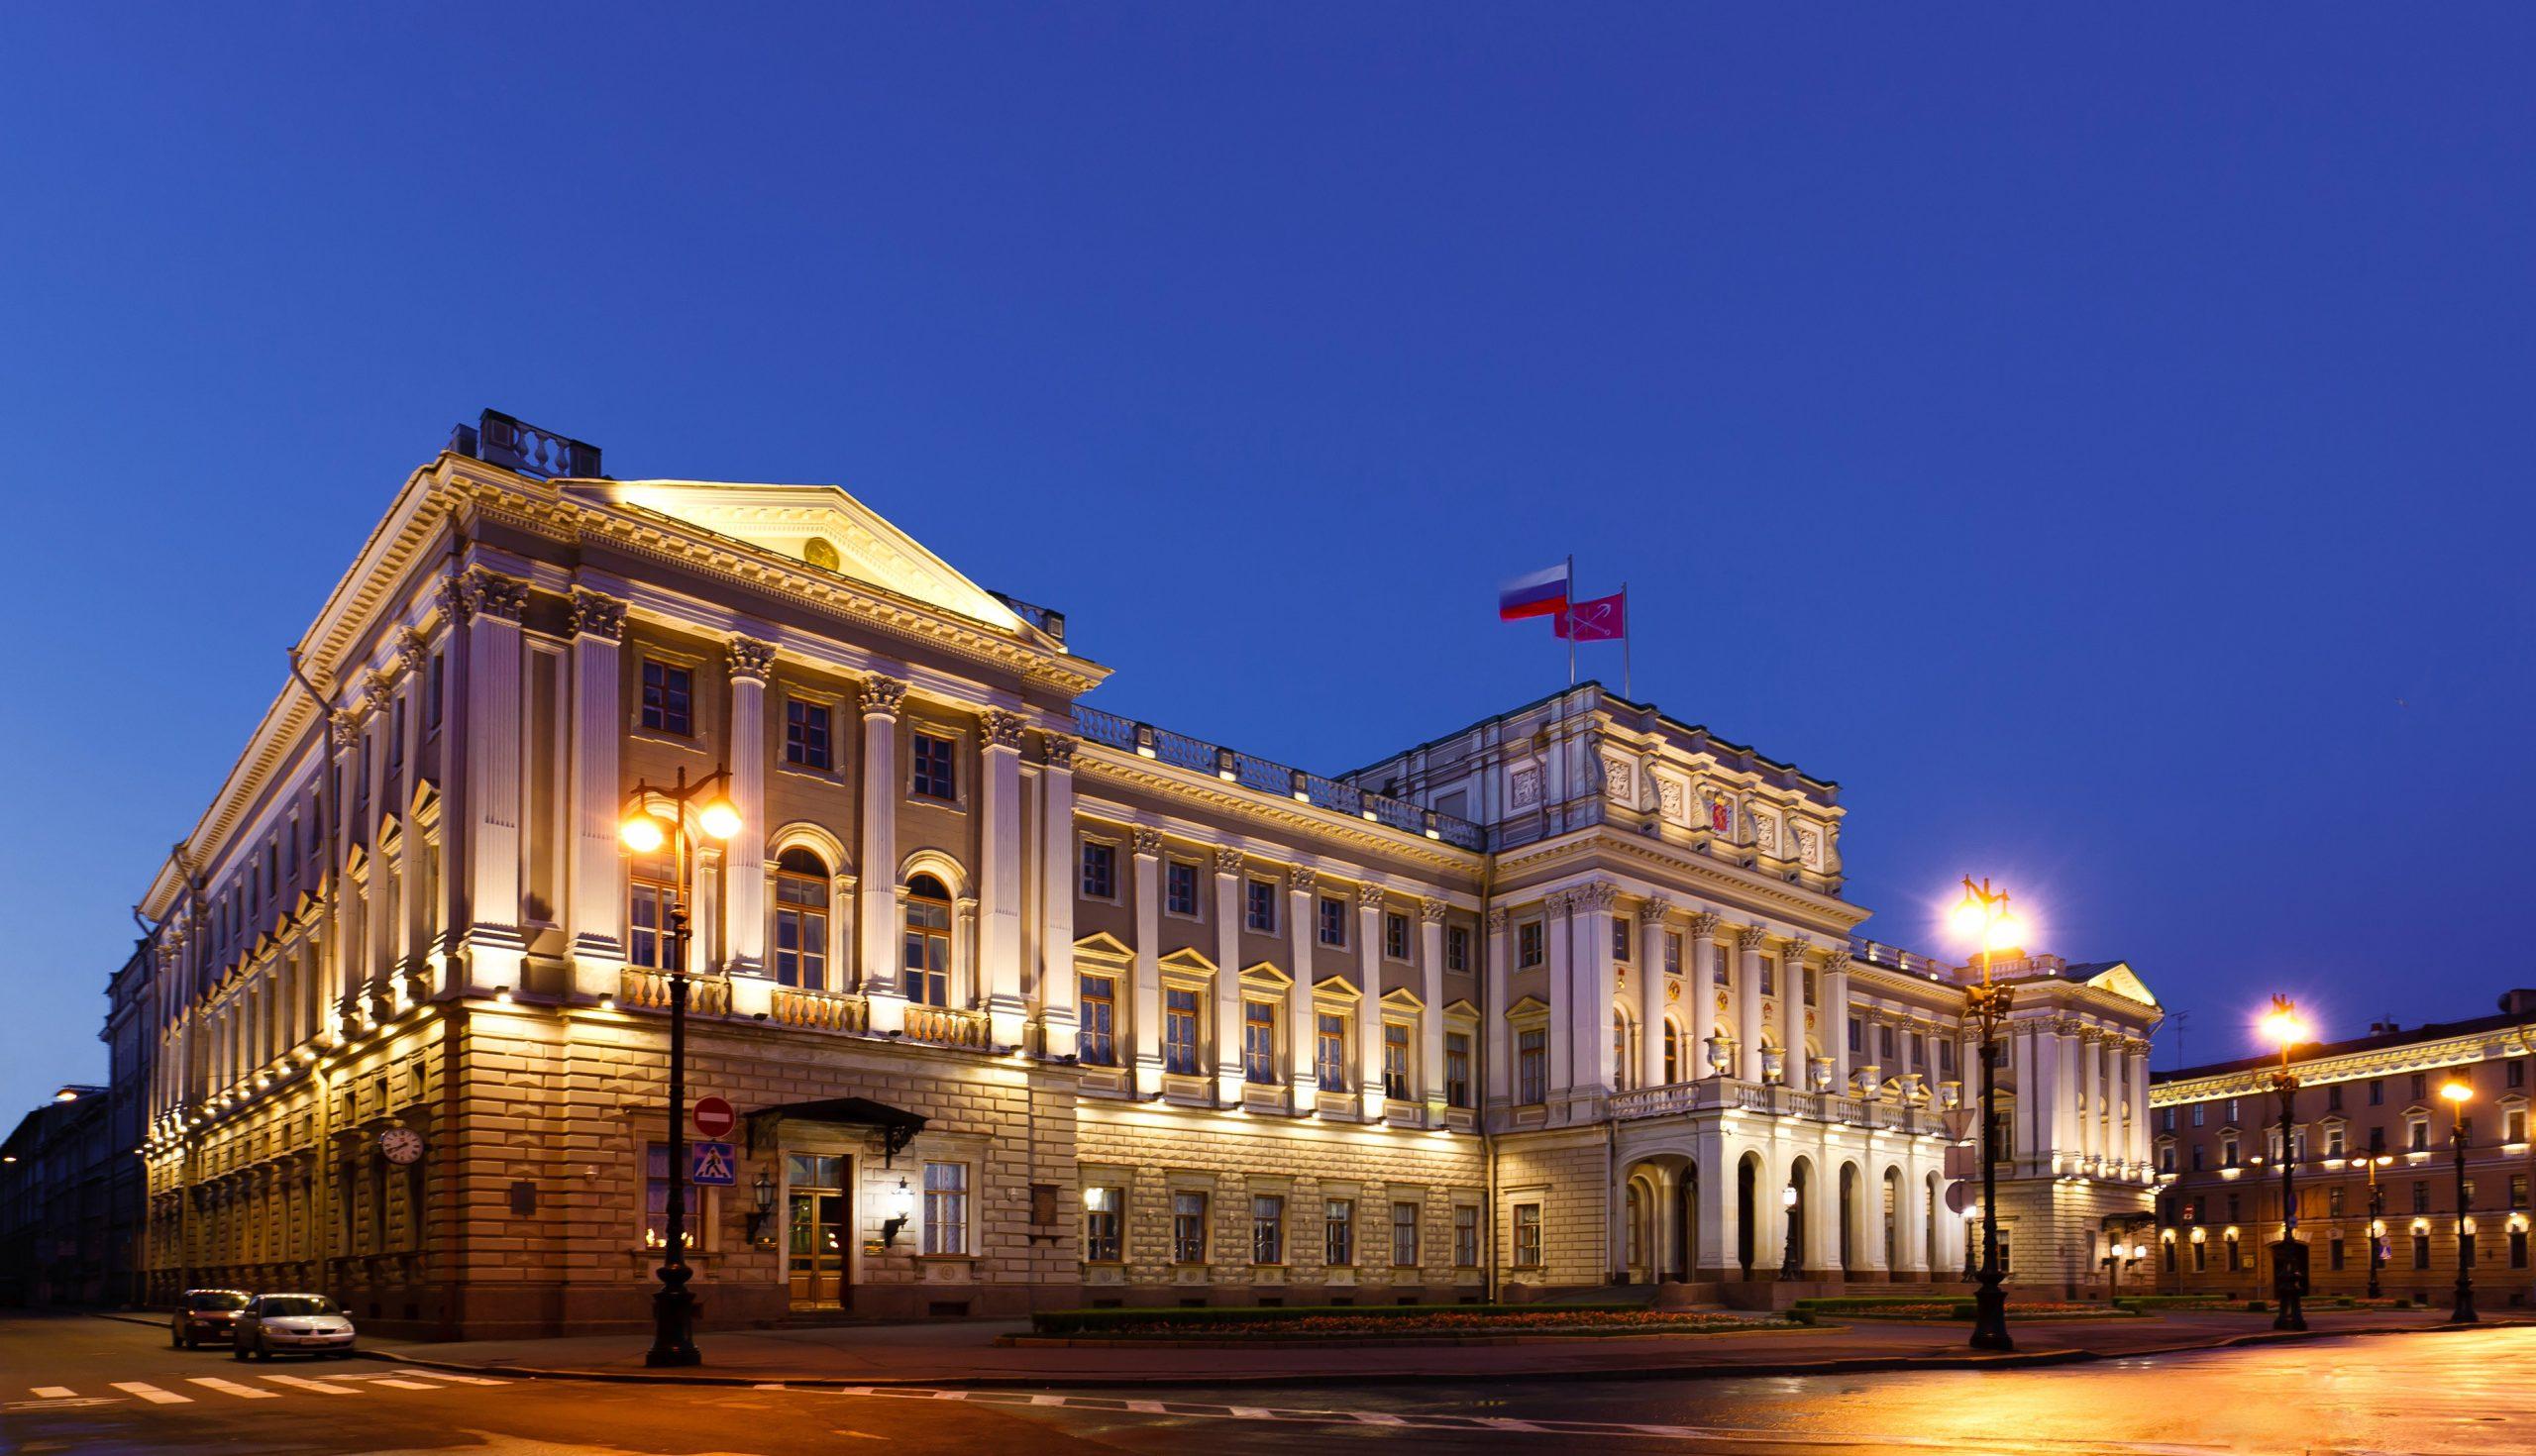 https://www.op78.ru/wp-content/uploads/2020/04/St_Petersburg_Mariinskiy_Palace-scaled.jpg